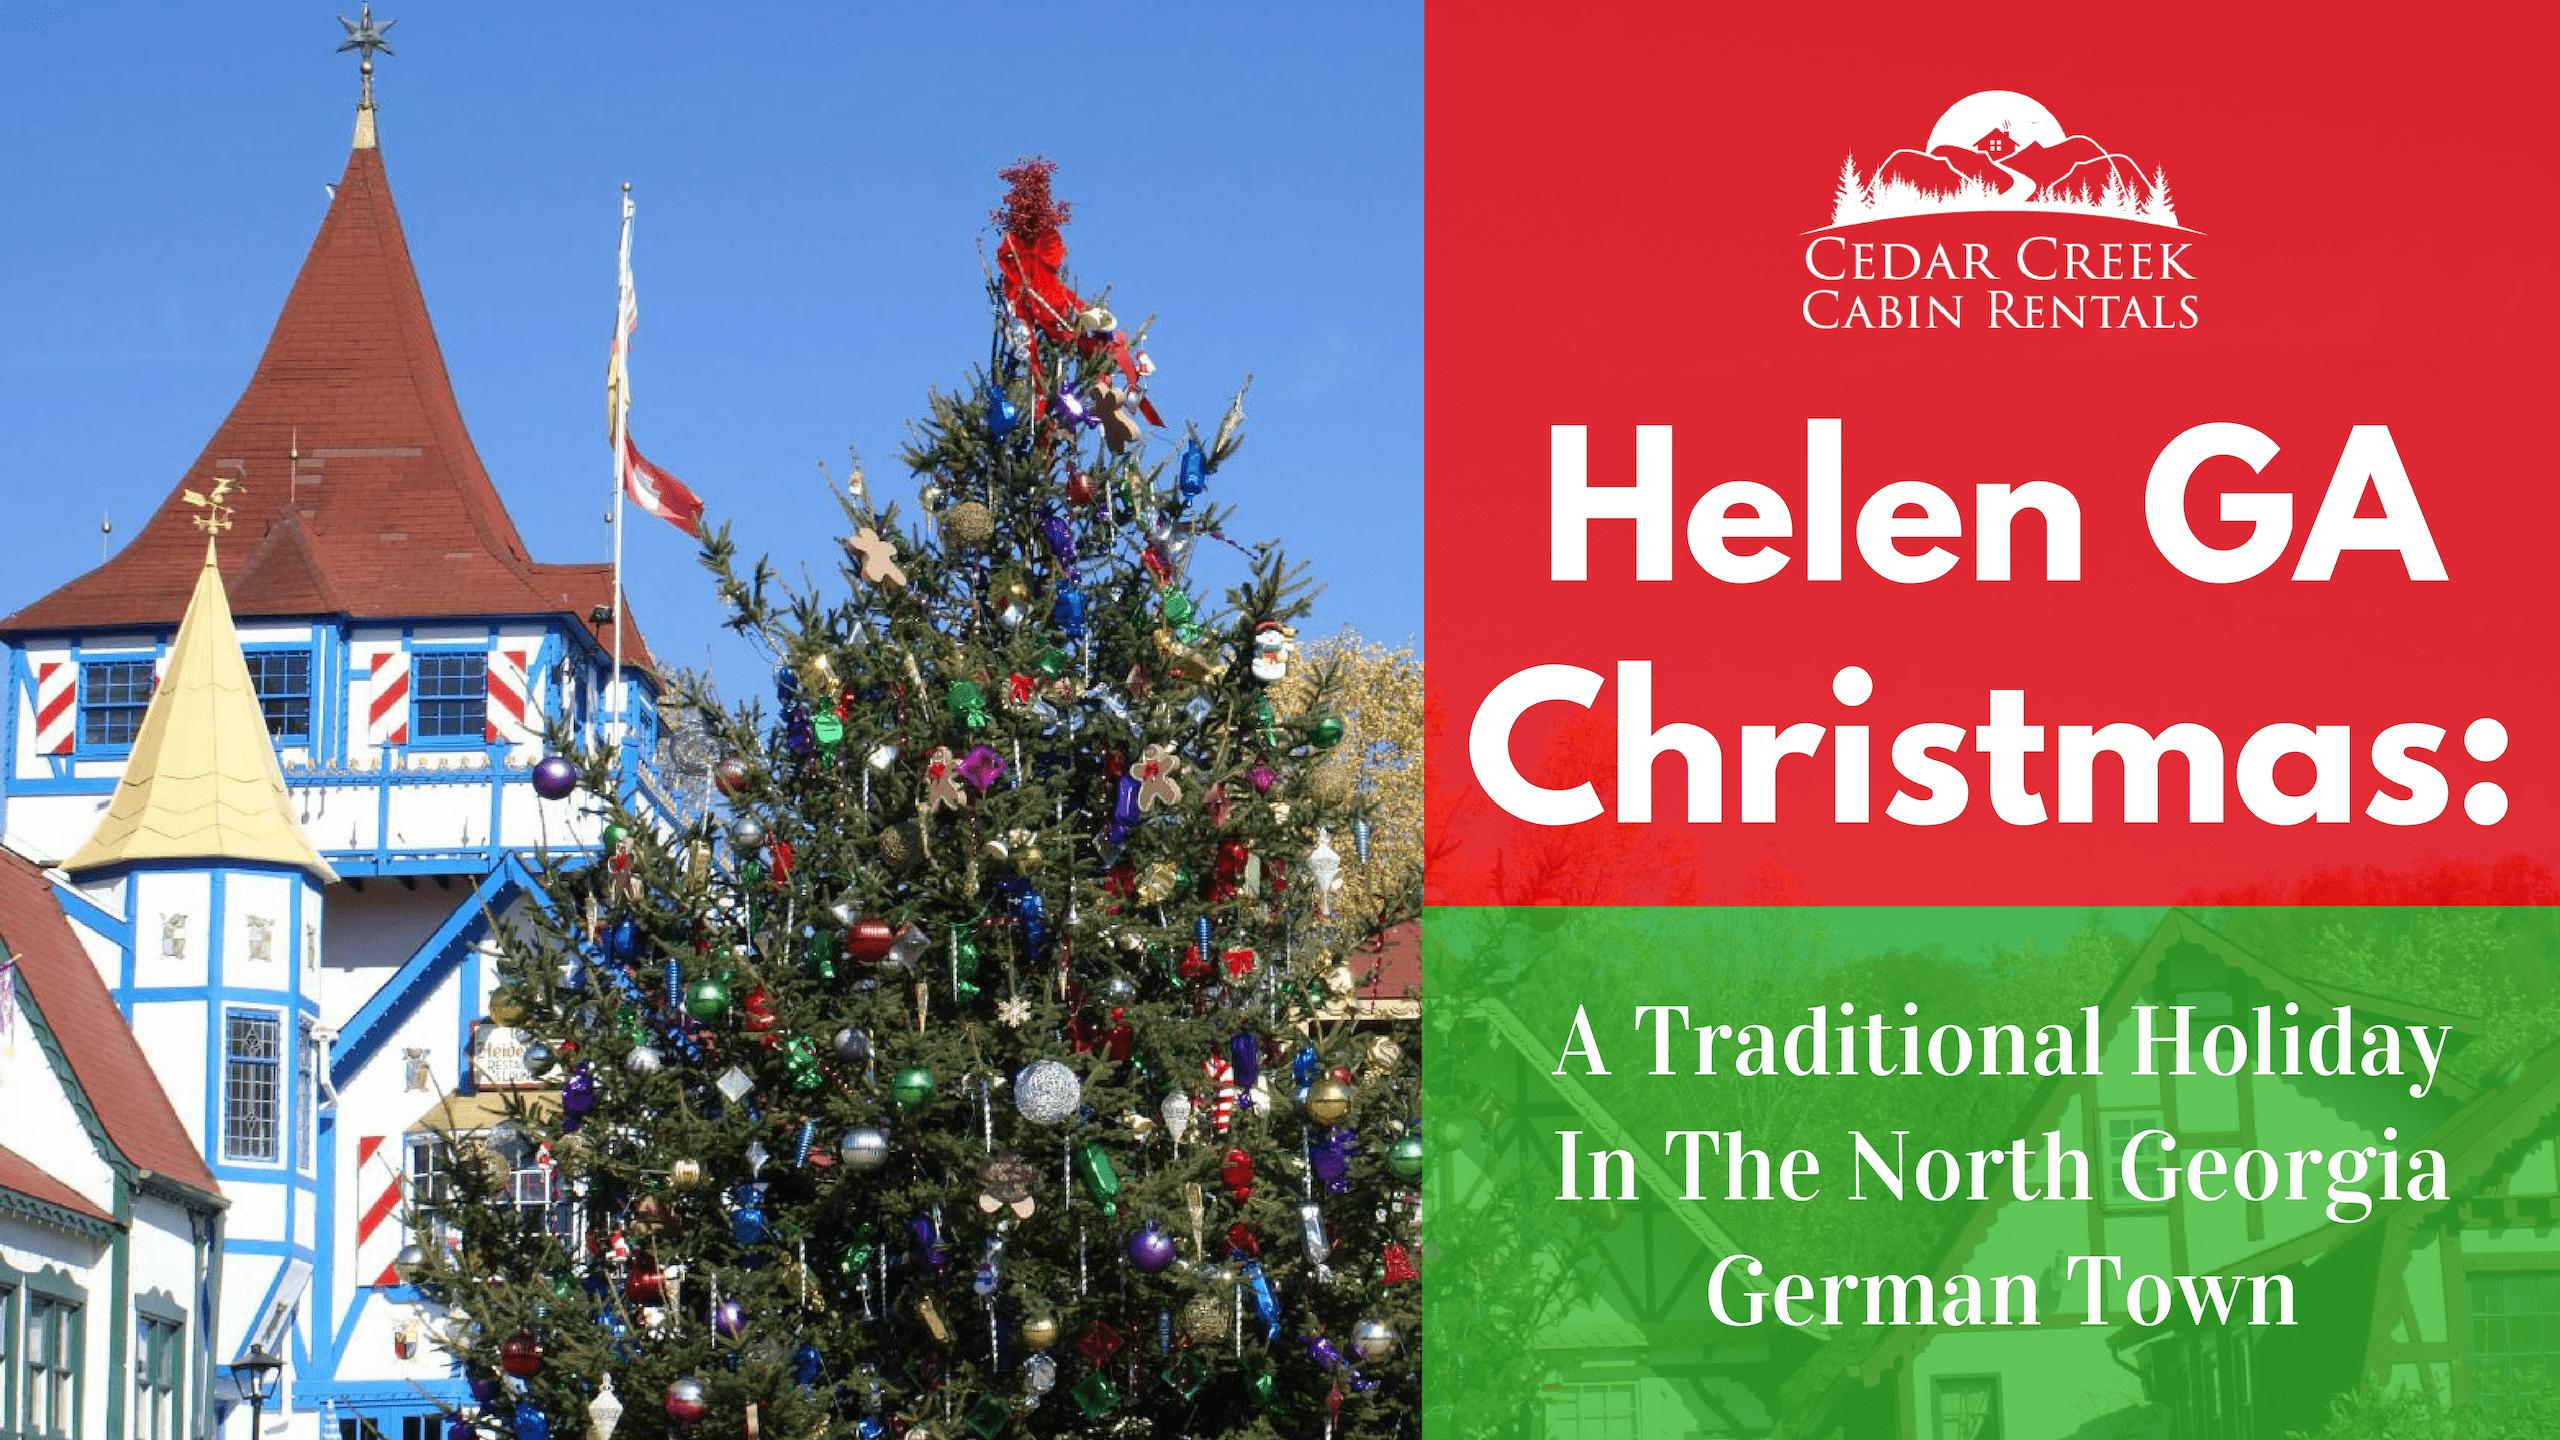 Christmas-Traditional-Holiday-Cedar-Creek-Cabin-Rentals-Helen-GA-Banner